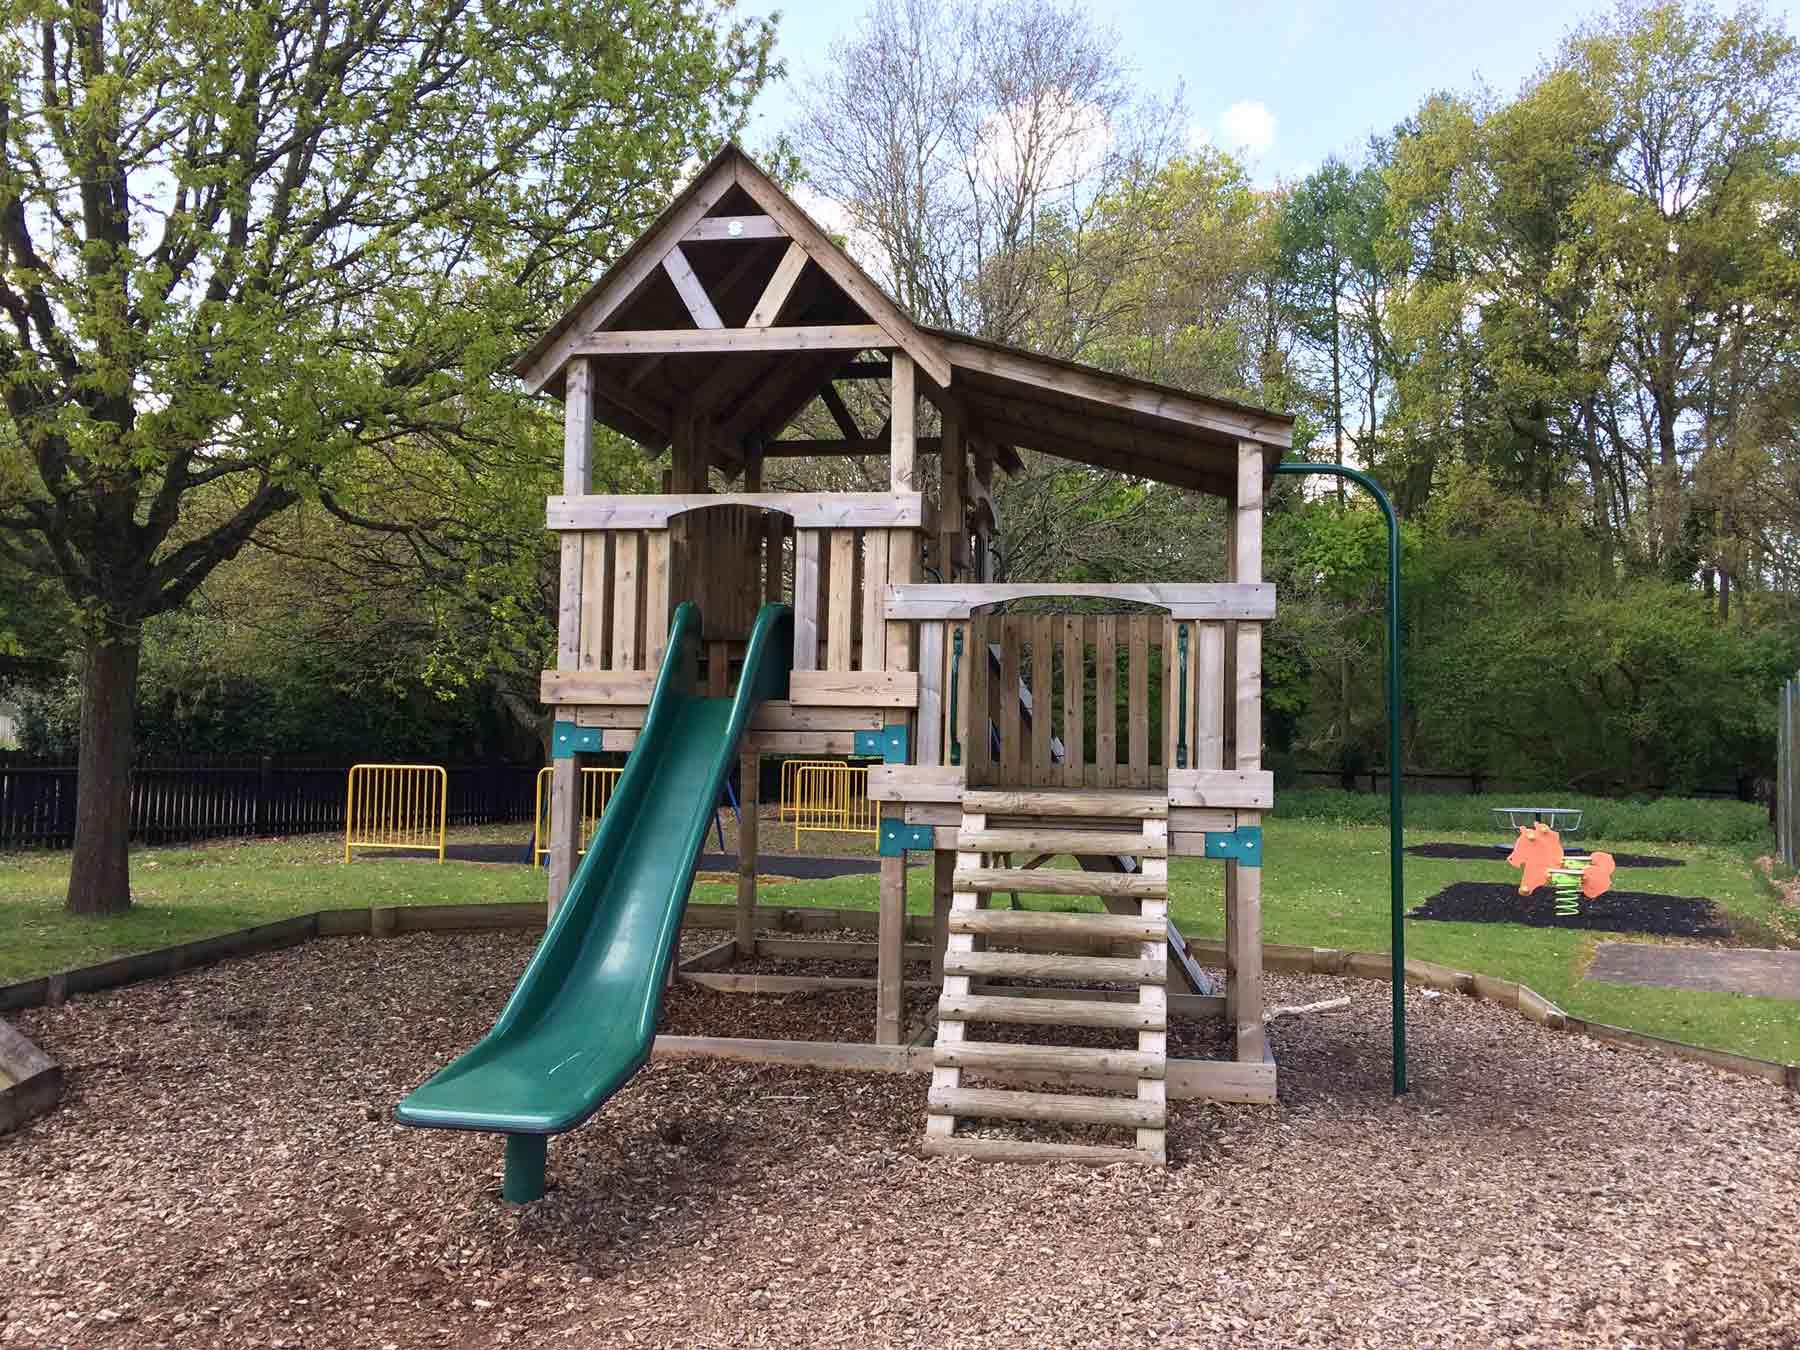 Mapledurwell Recreation Ground and Play Area